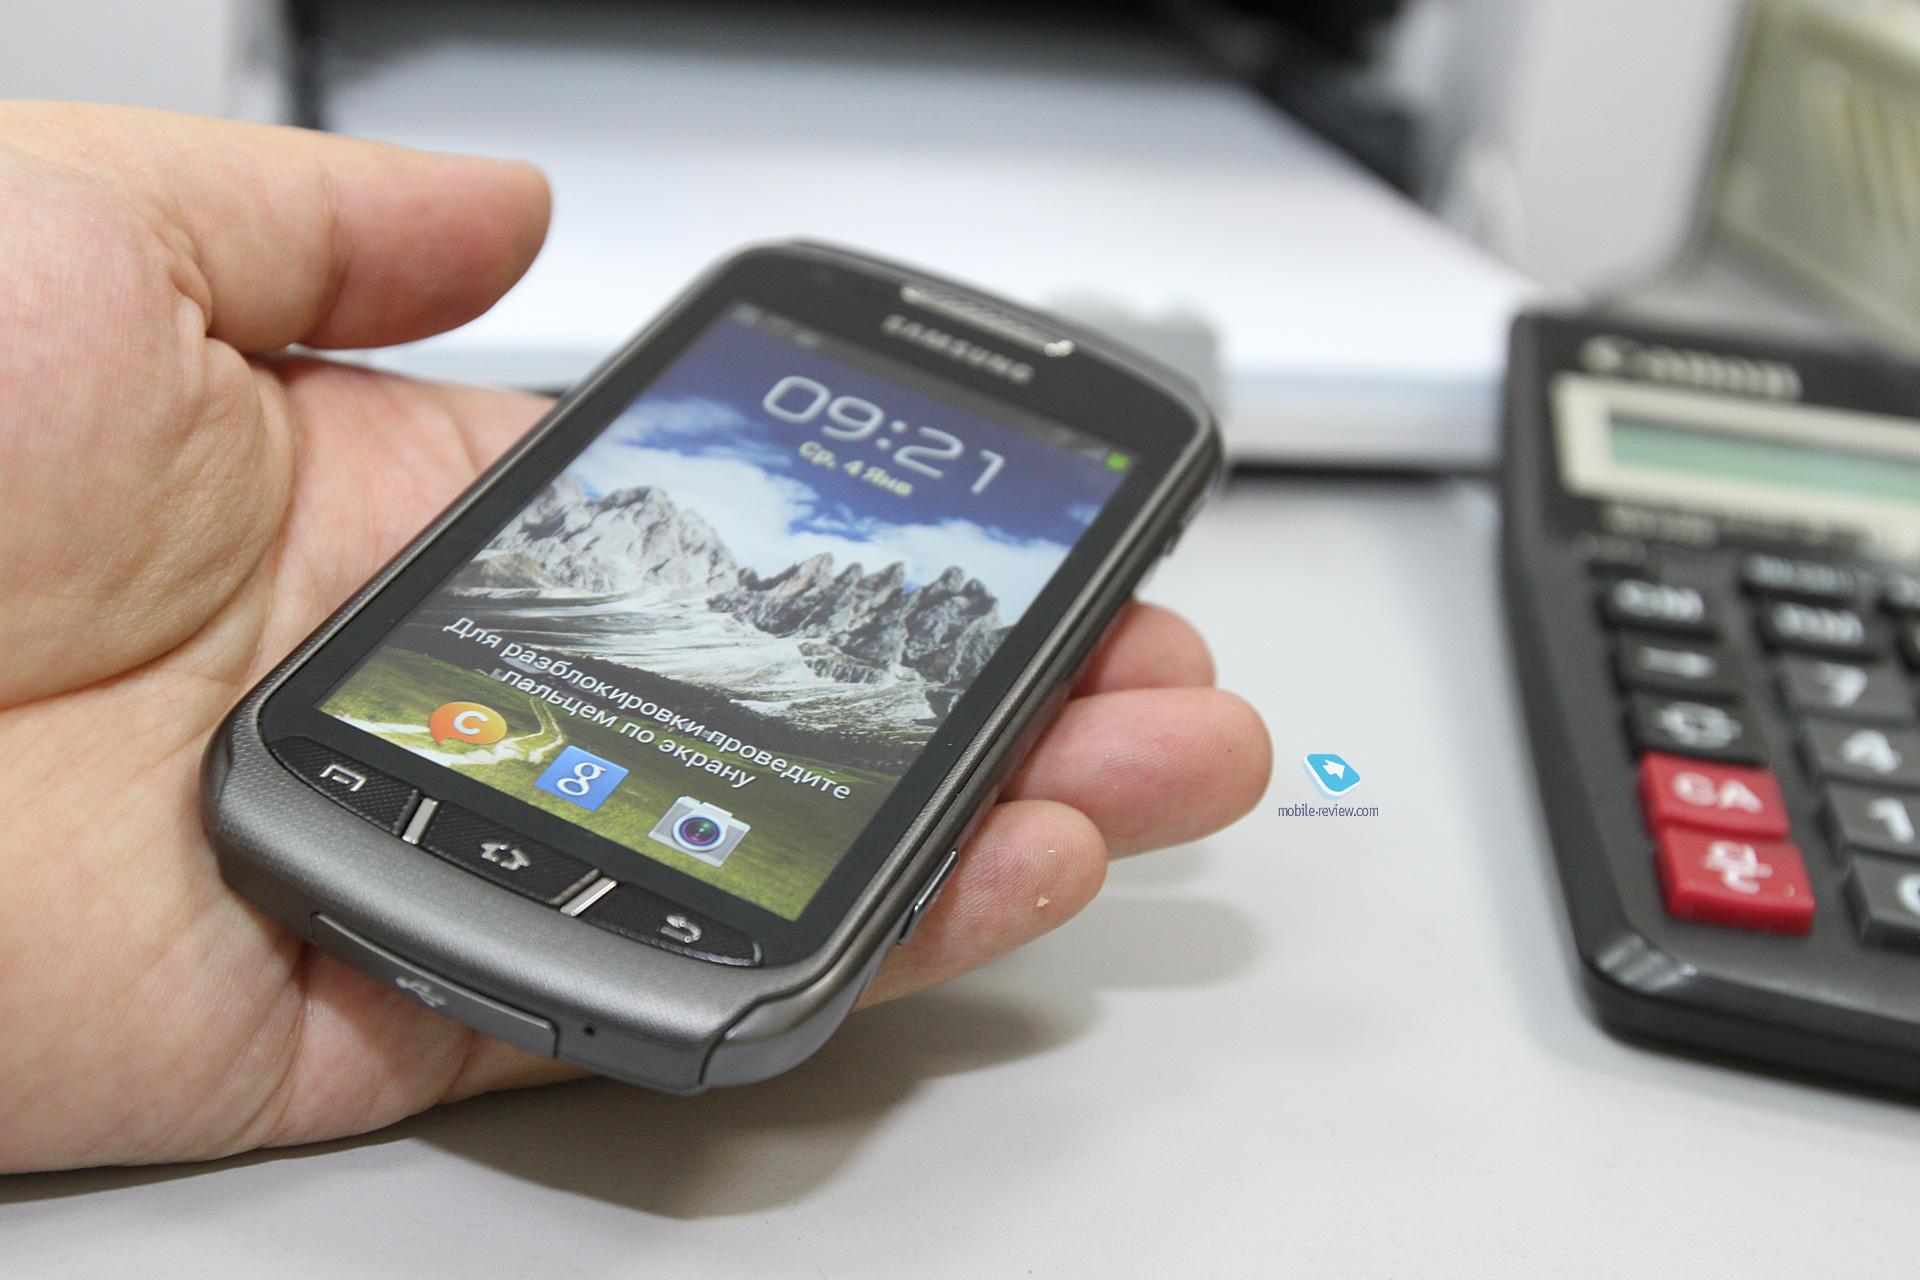 Крепеж смартфона samsung (самсунг) phantom дешево шнур iphone phantom с обратным разъемом